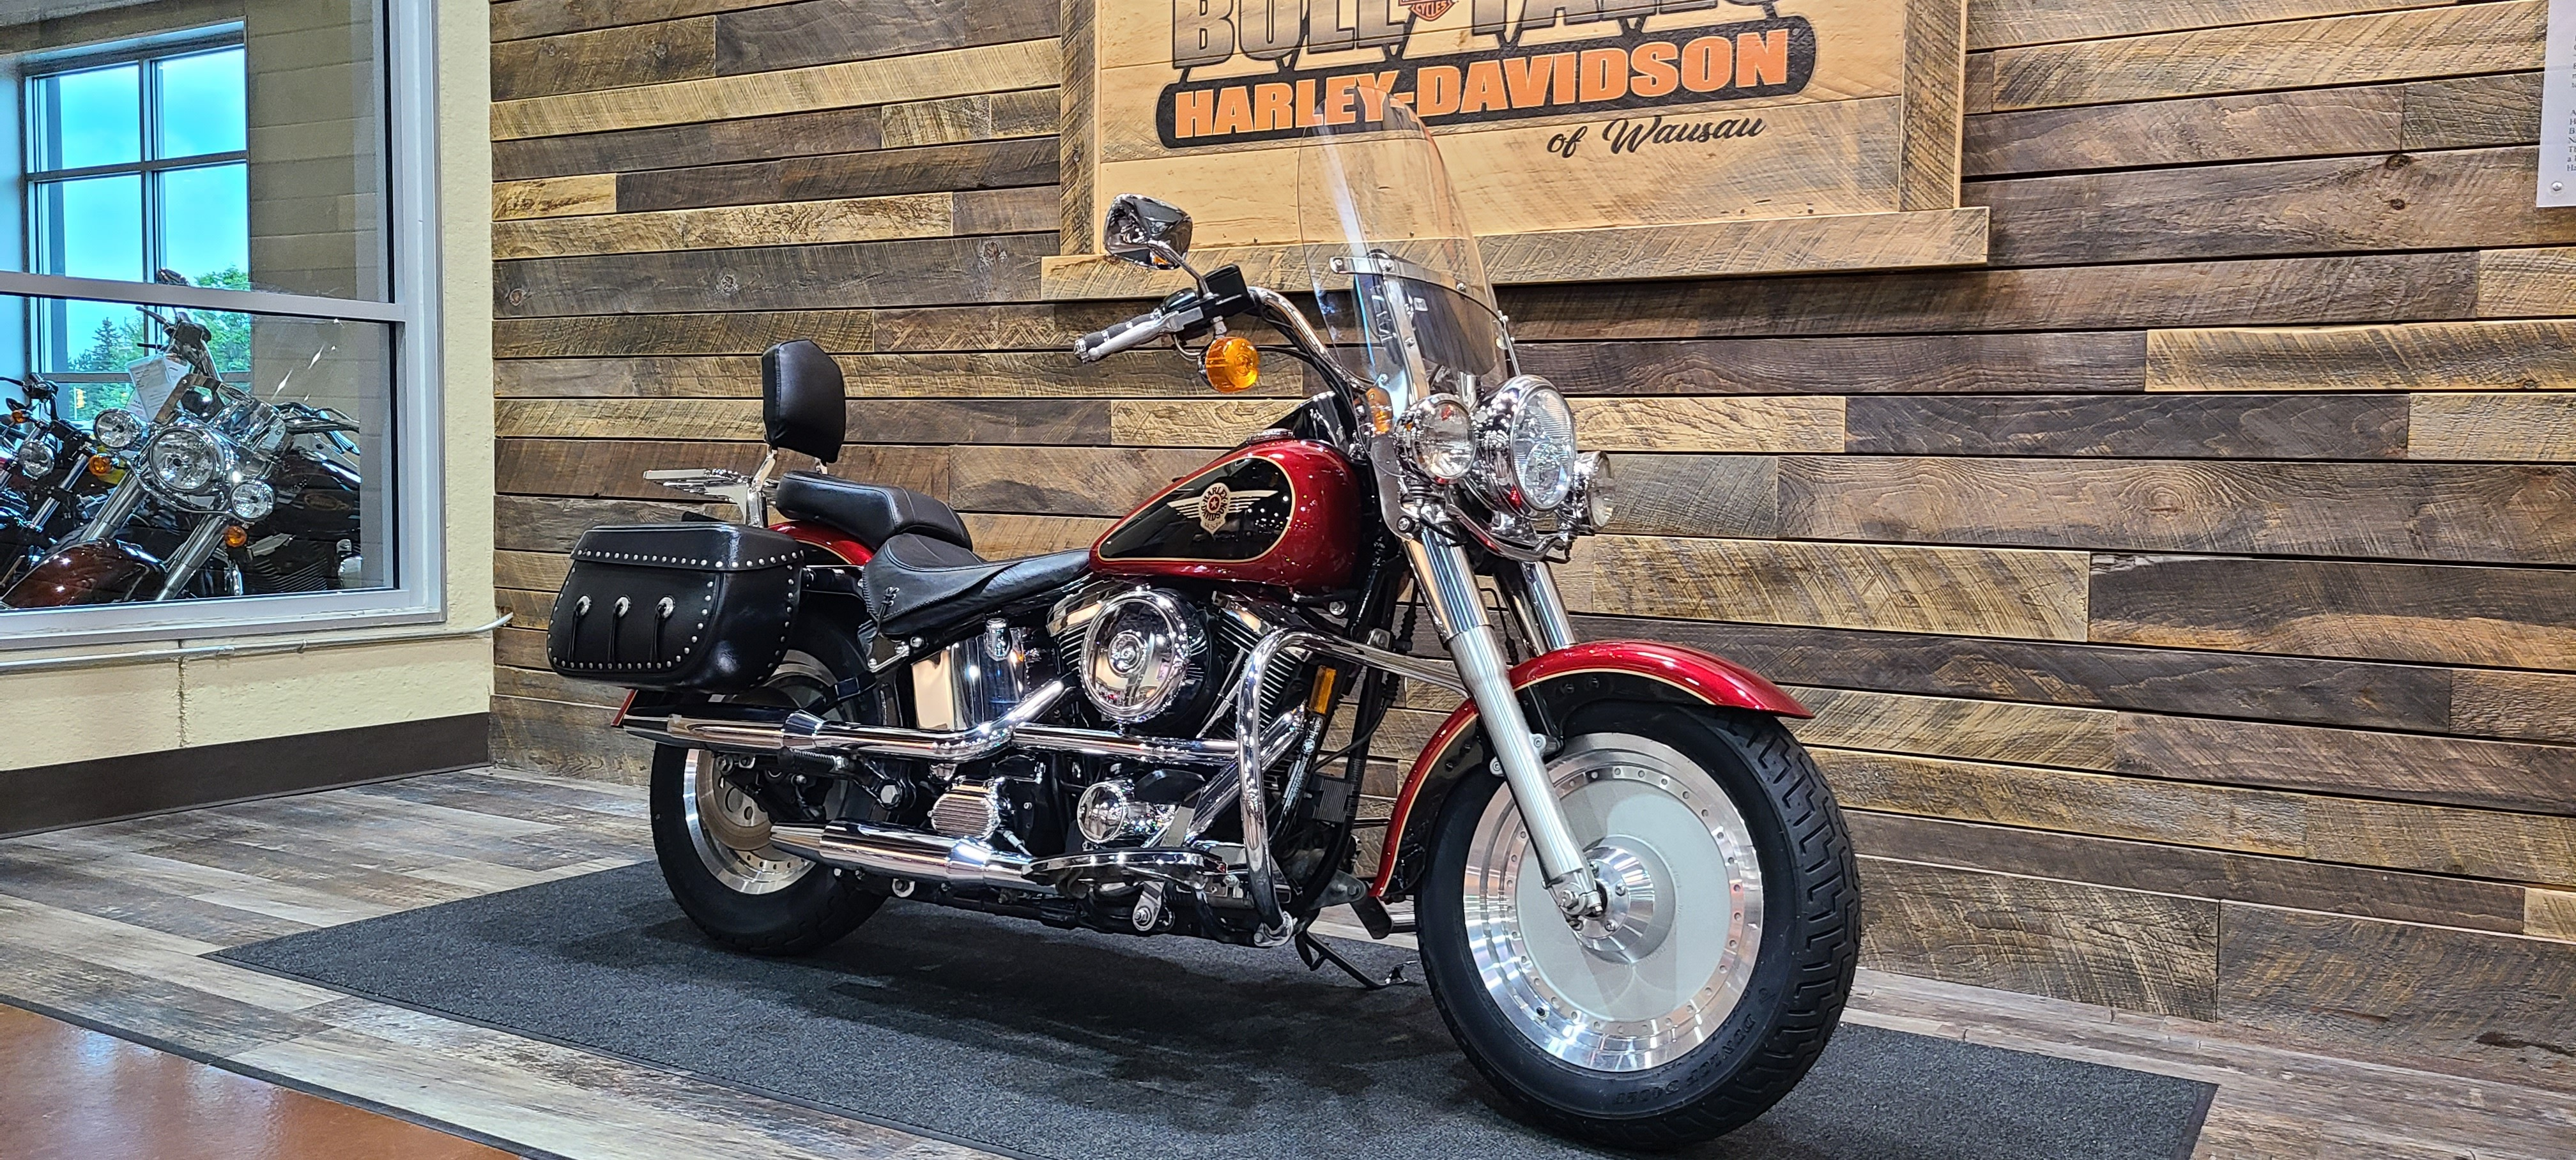 1998 Harley-Davidson FLSTF at Bull Falls Harley-Davidson